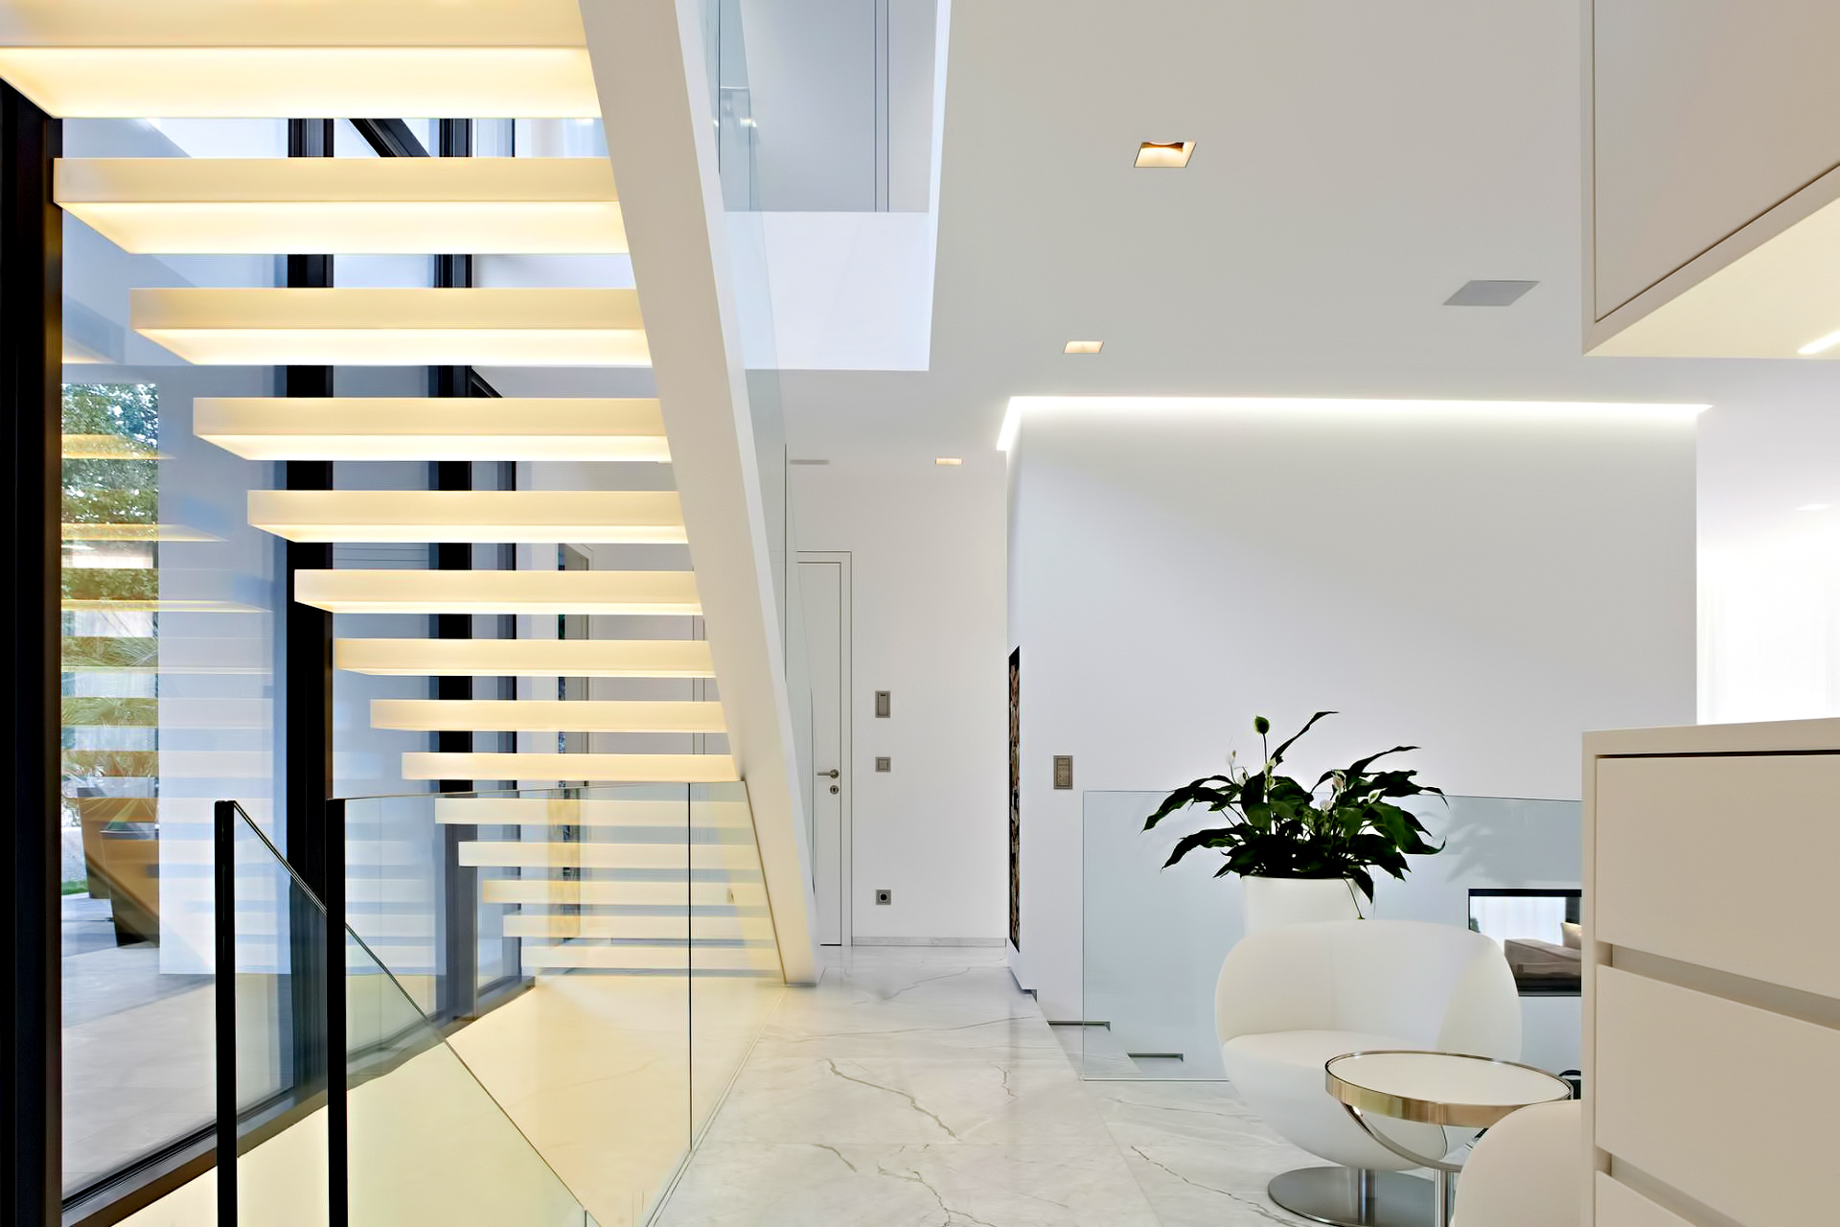 House M Luxury Residence – Merano, South Tyrol, Italy